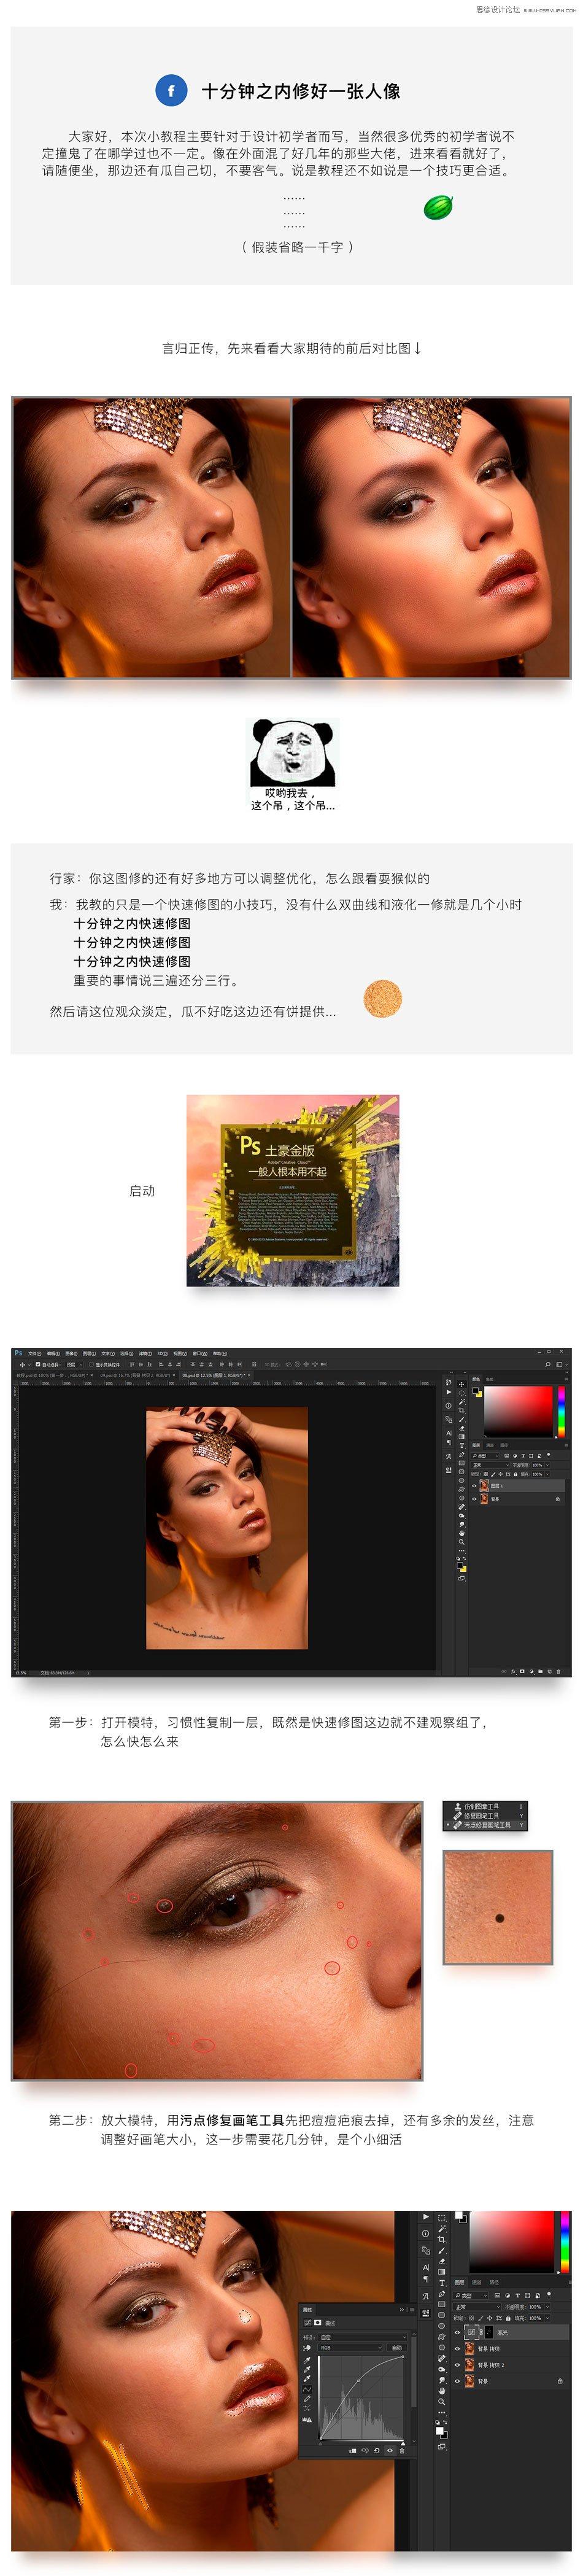 Photoshop快速的给人像照片光滑磨皮,PS教程,思缘教程网